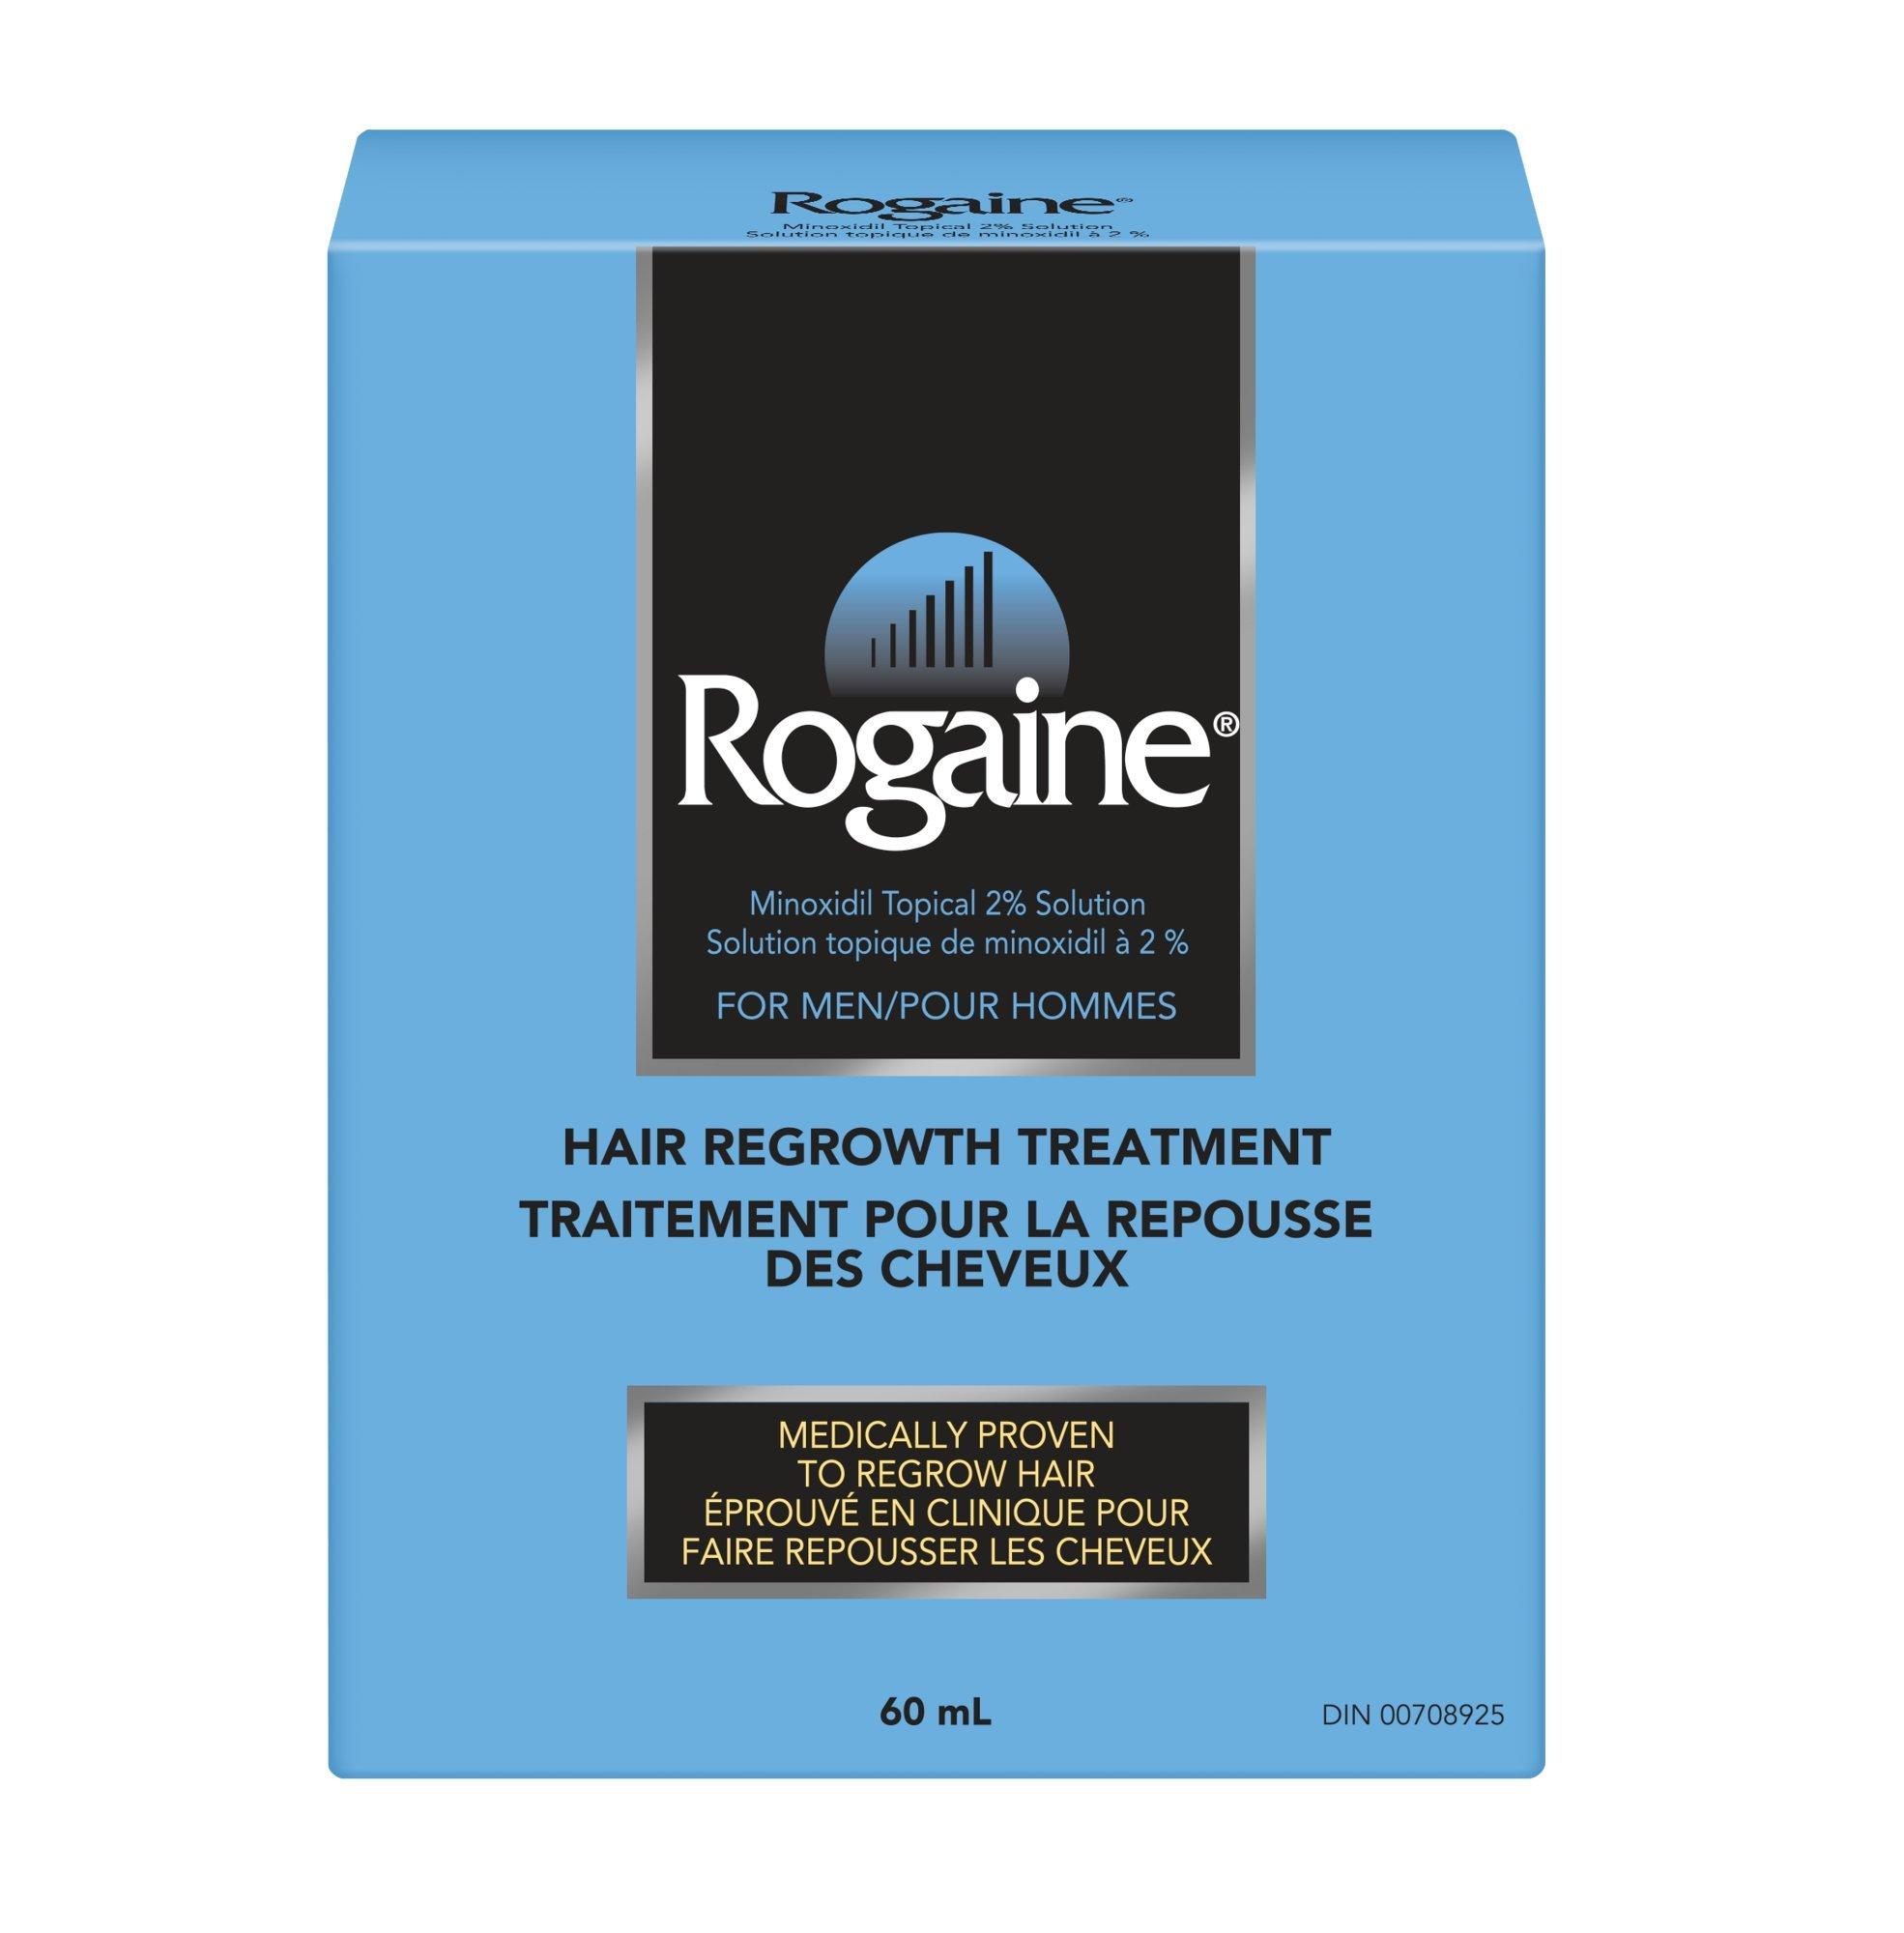 Rogaine Men's Rogaine 2% Minoxidil Topical Solution - Hair